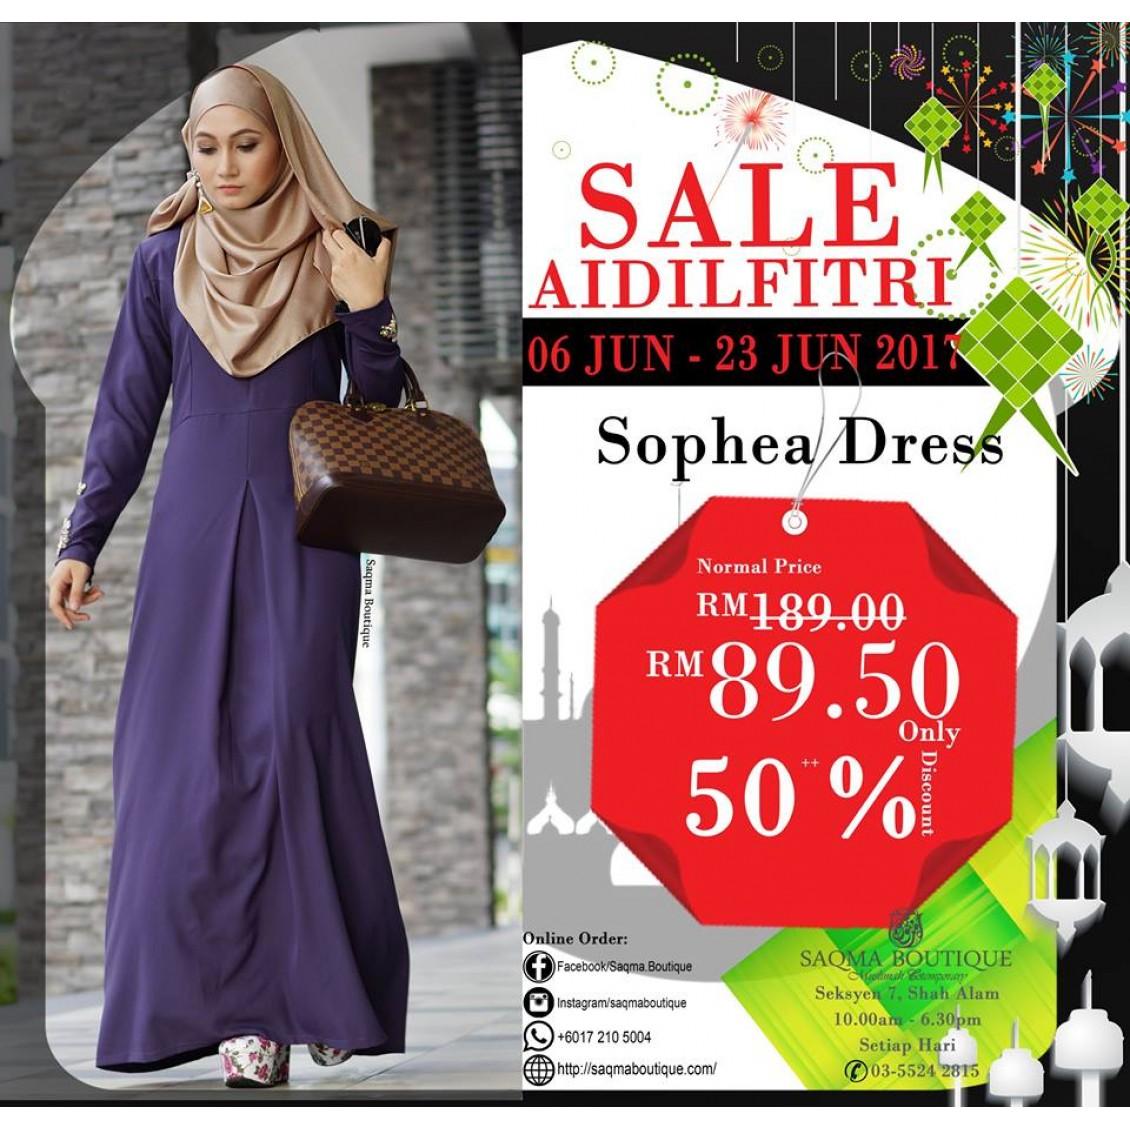 Sophea Dress